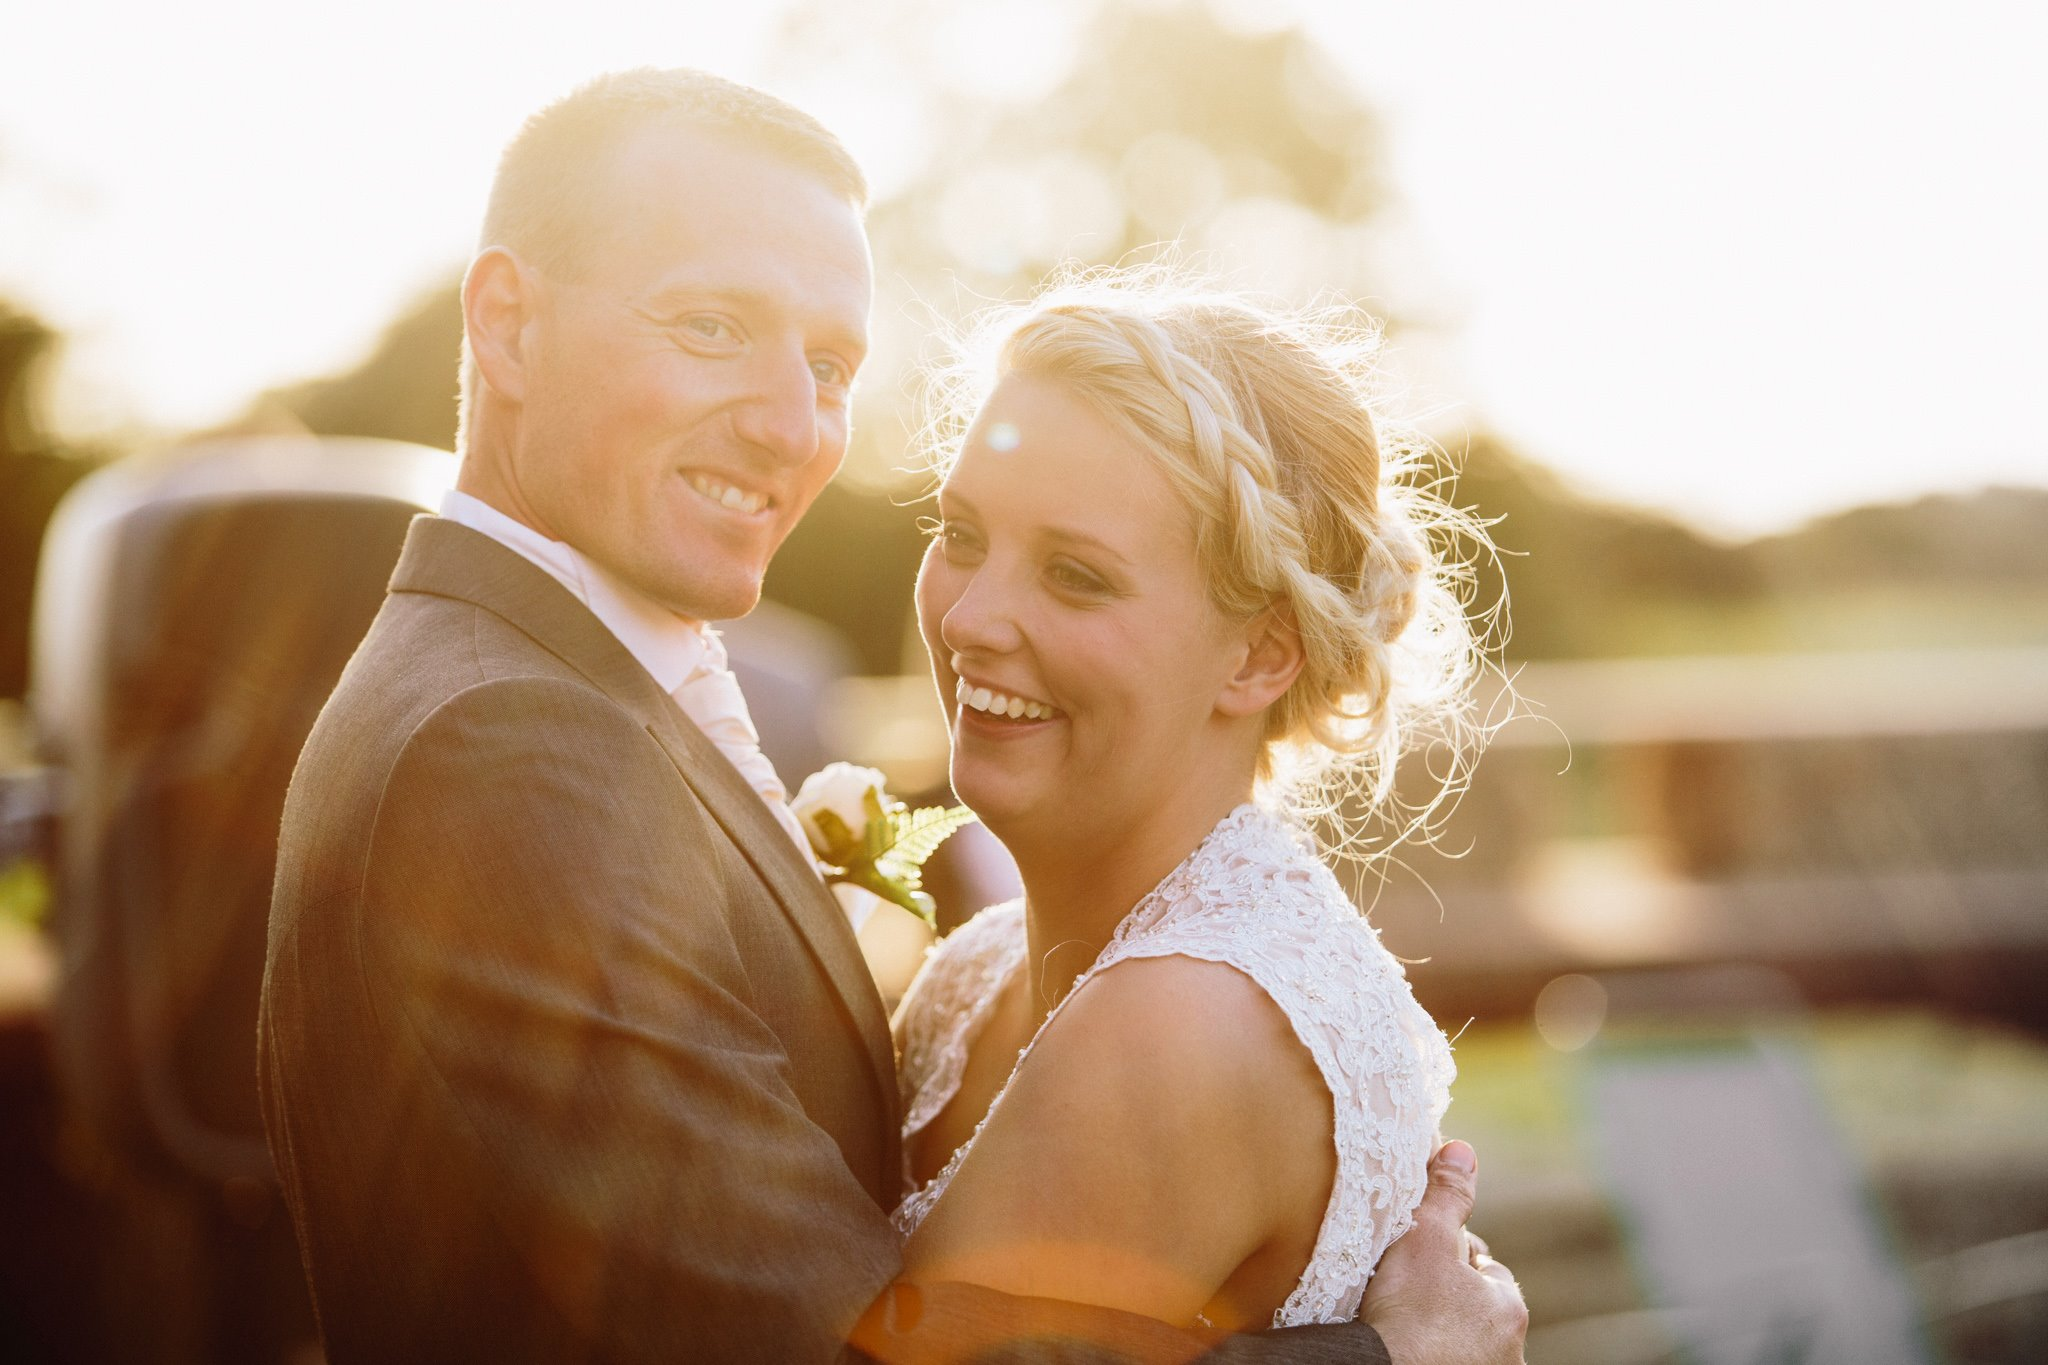 Golden hour golden light wedding photography Matt Herrington North West Wedding Photographer